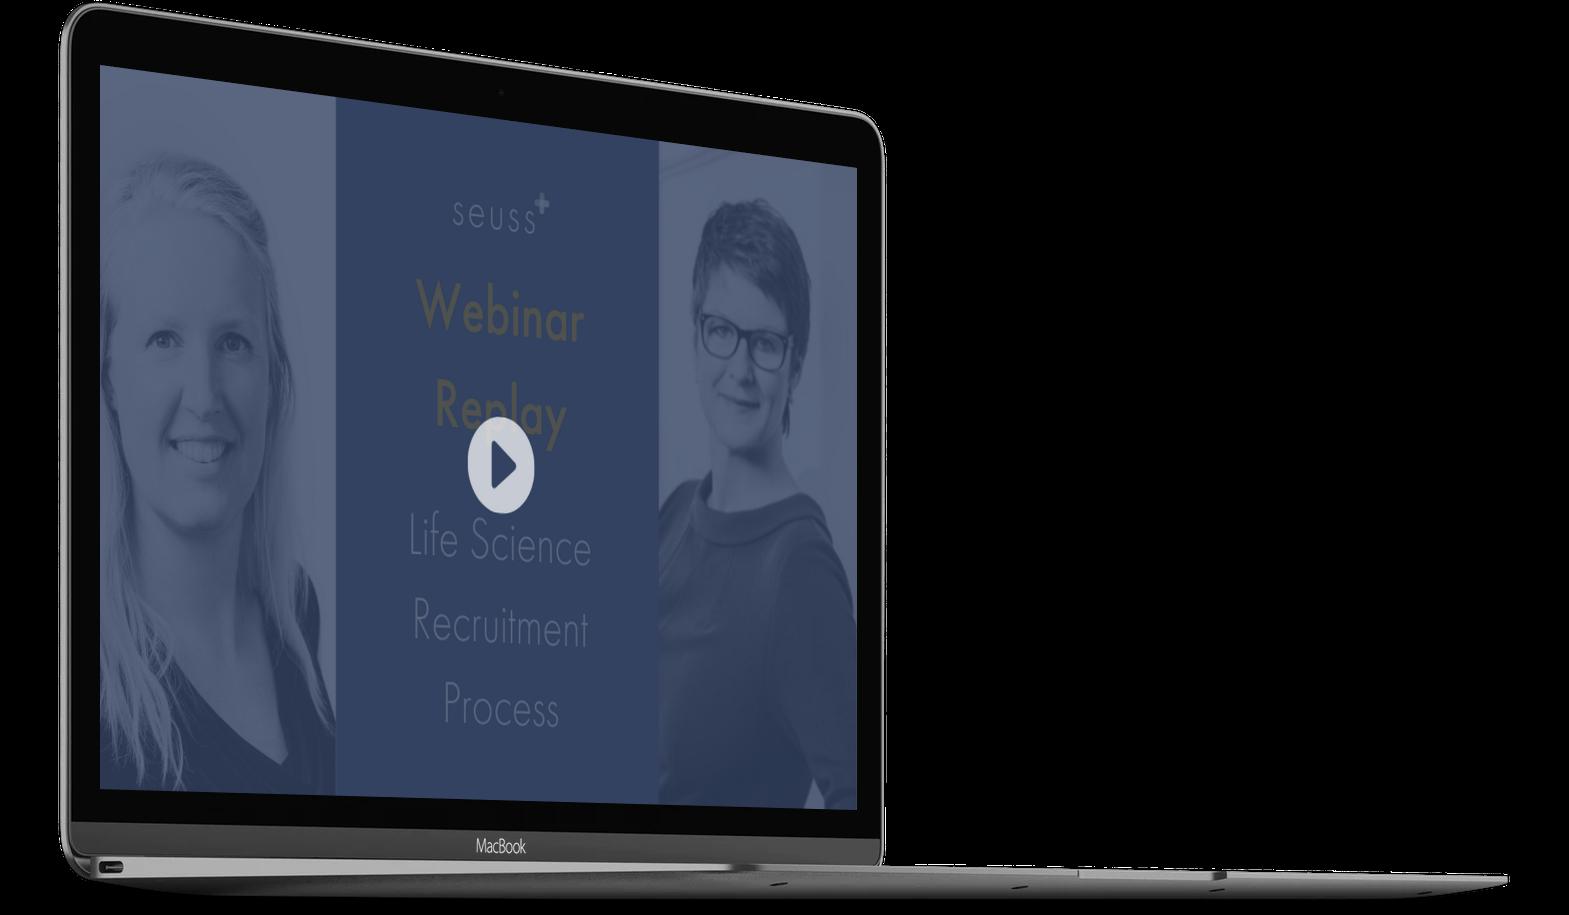 mockup_life science recruitment webinar